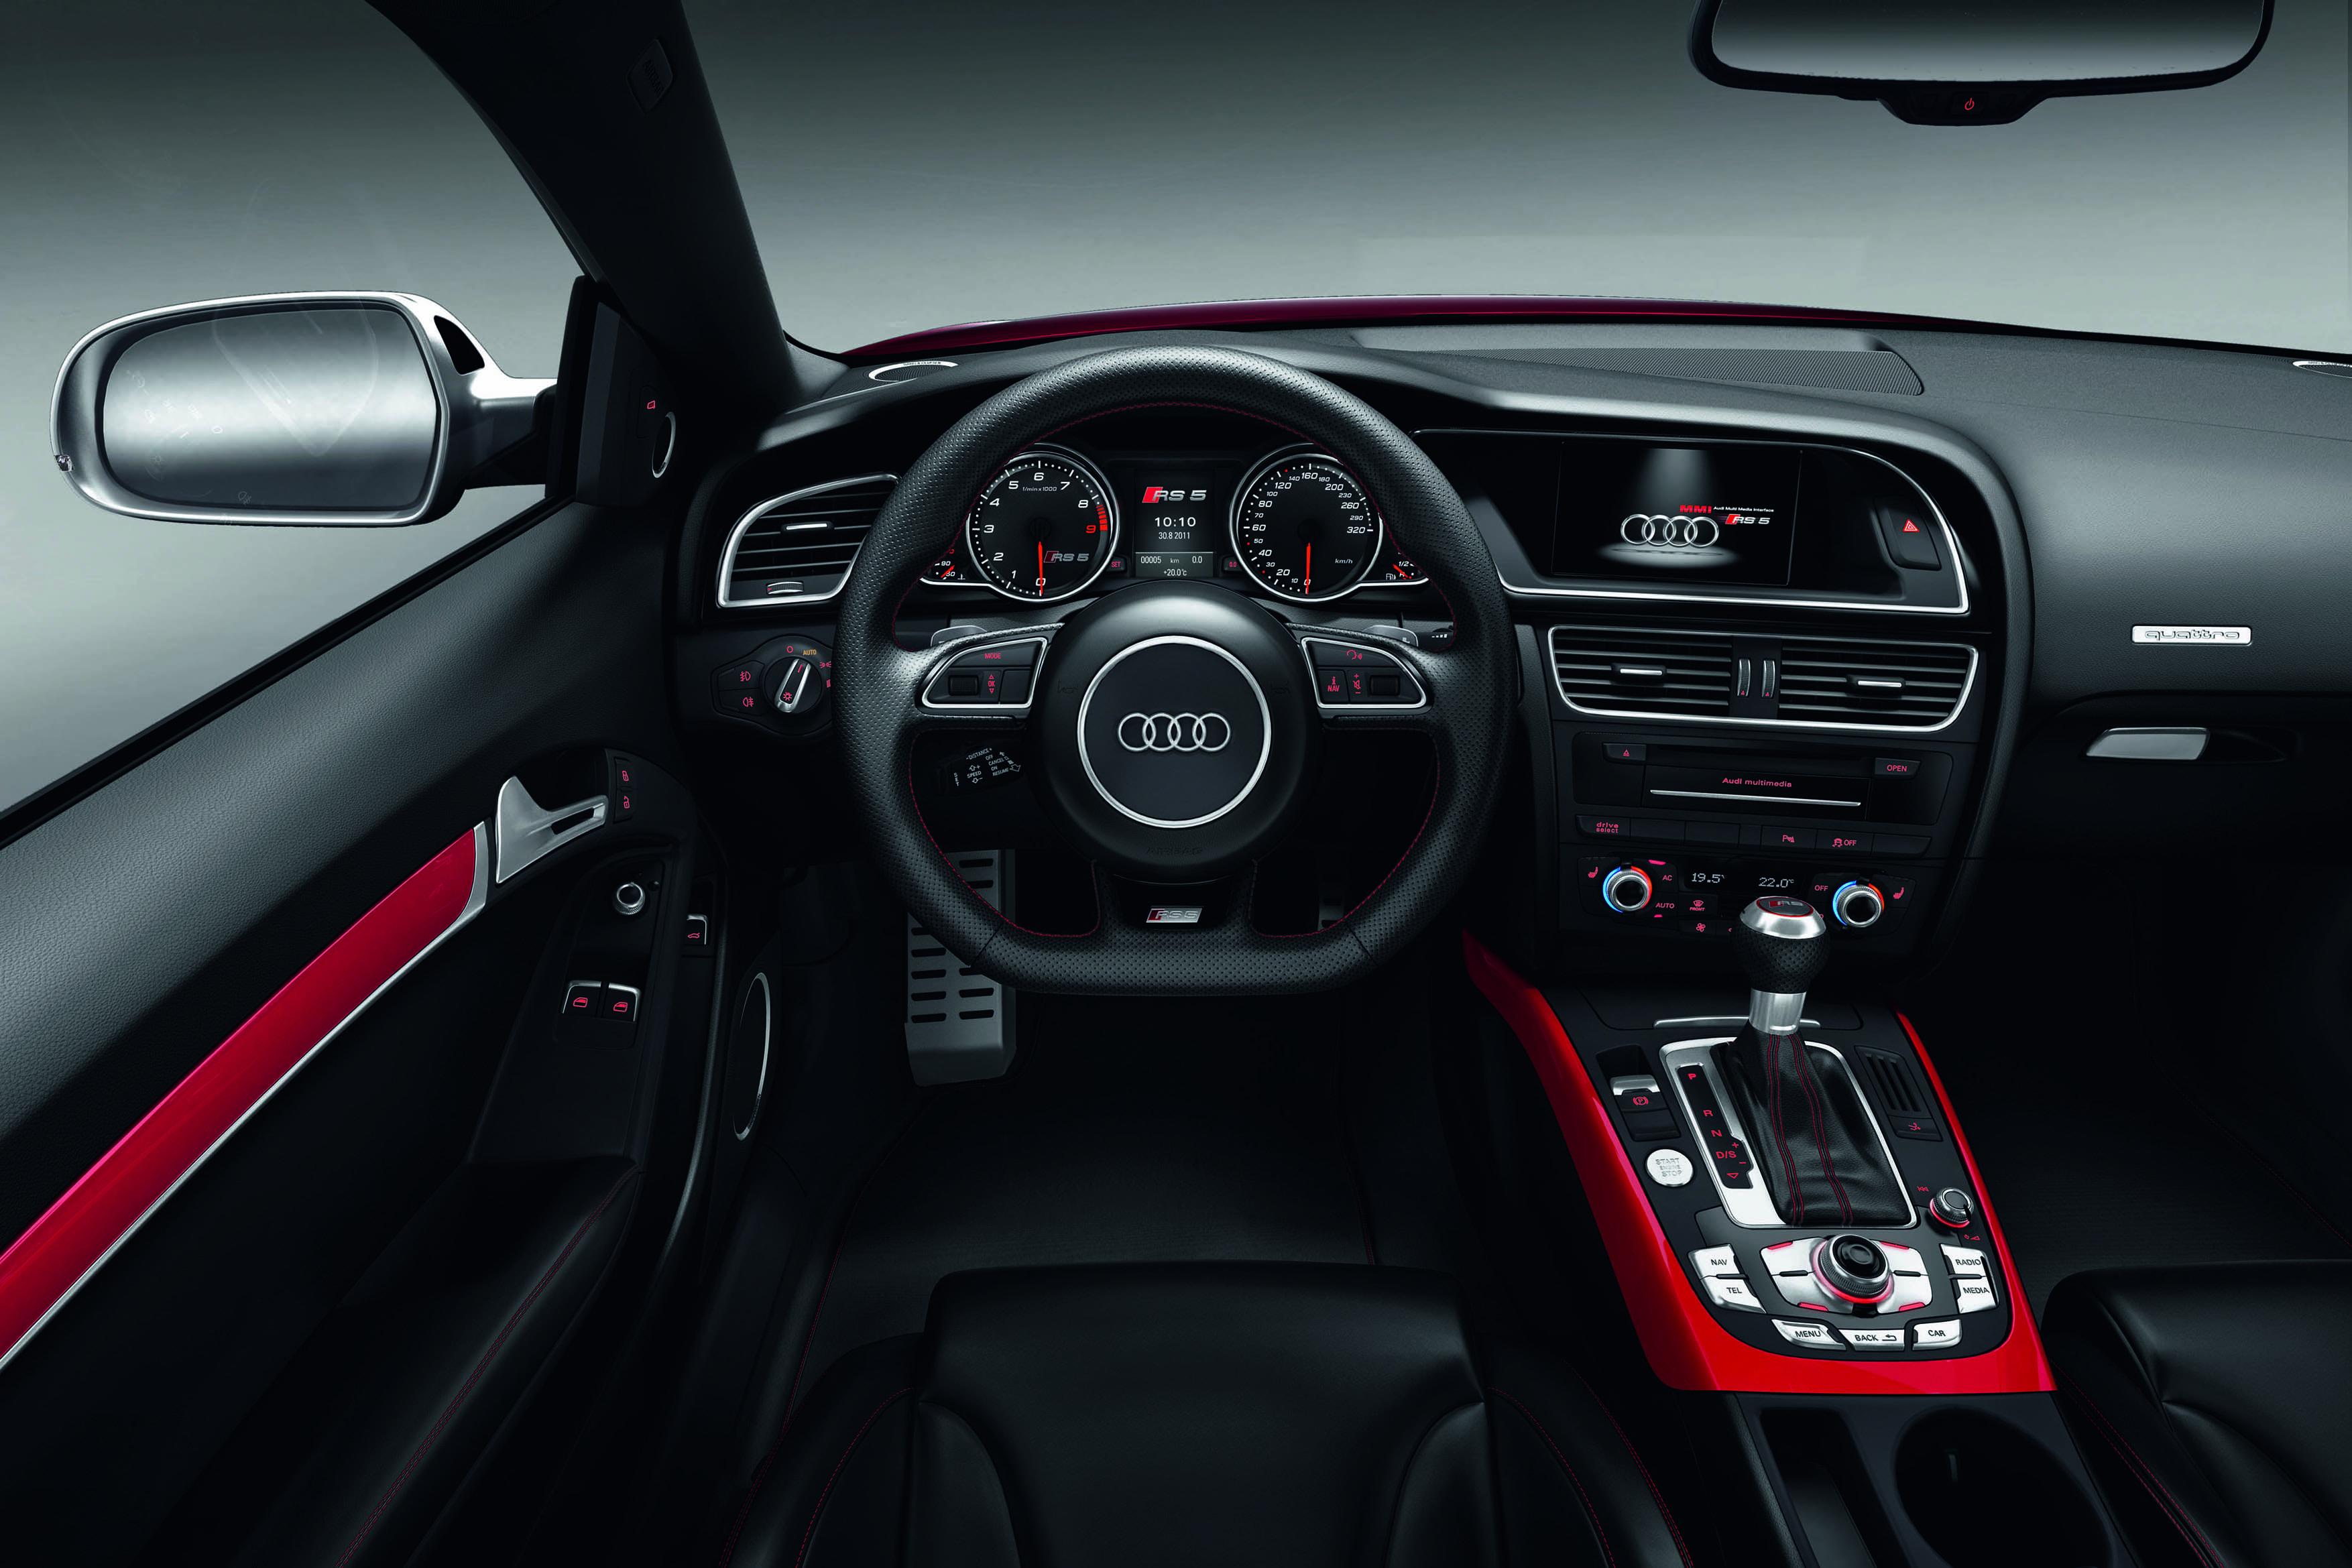 2012 Audi RS5 Full hd wallpapers